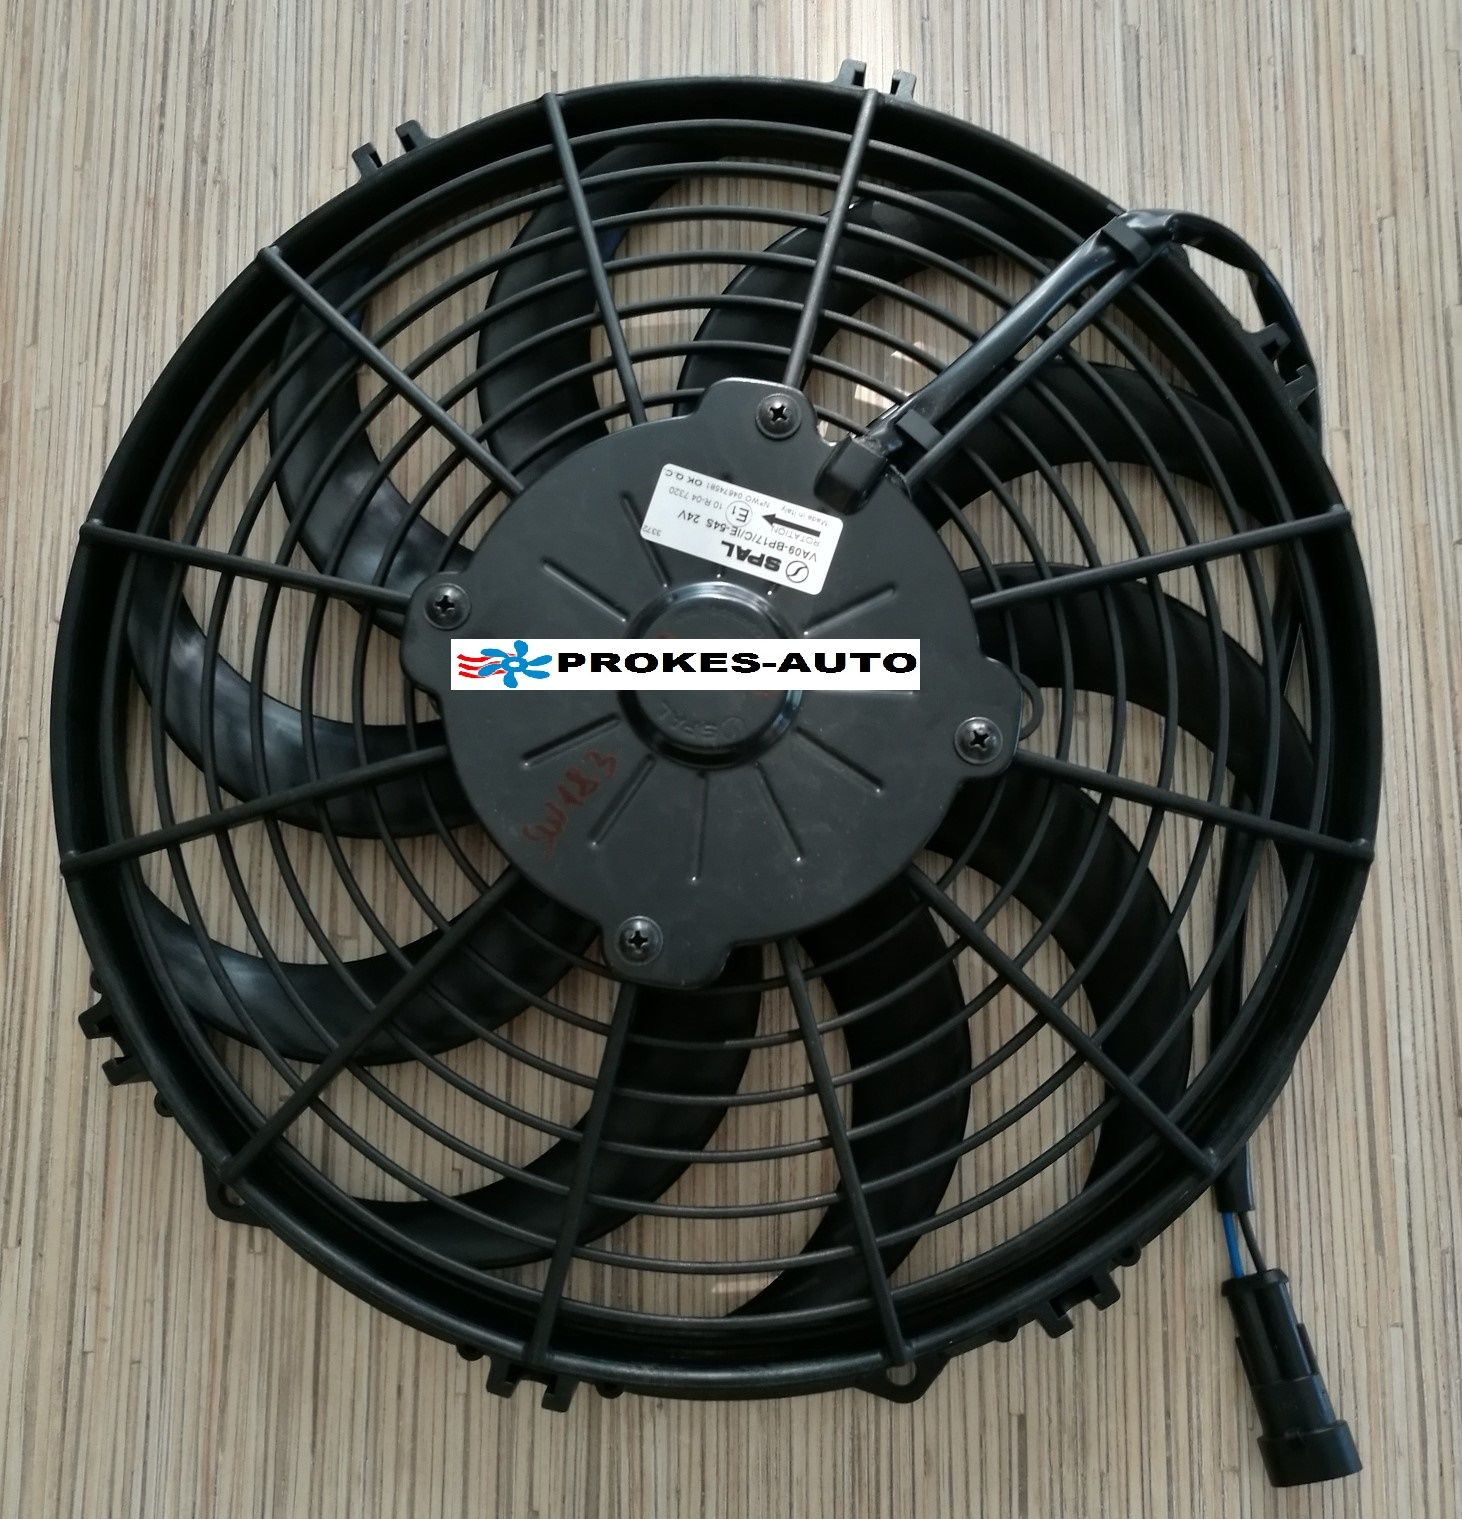 Ventilátor kondenzátoru 24V pro Sleeping Well Oblo / Fresco 3000 / 30315263 SPAL